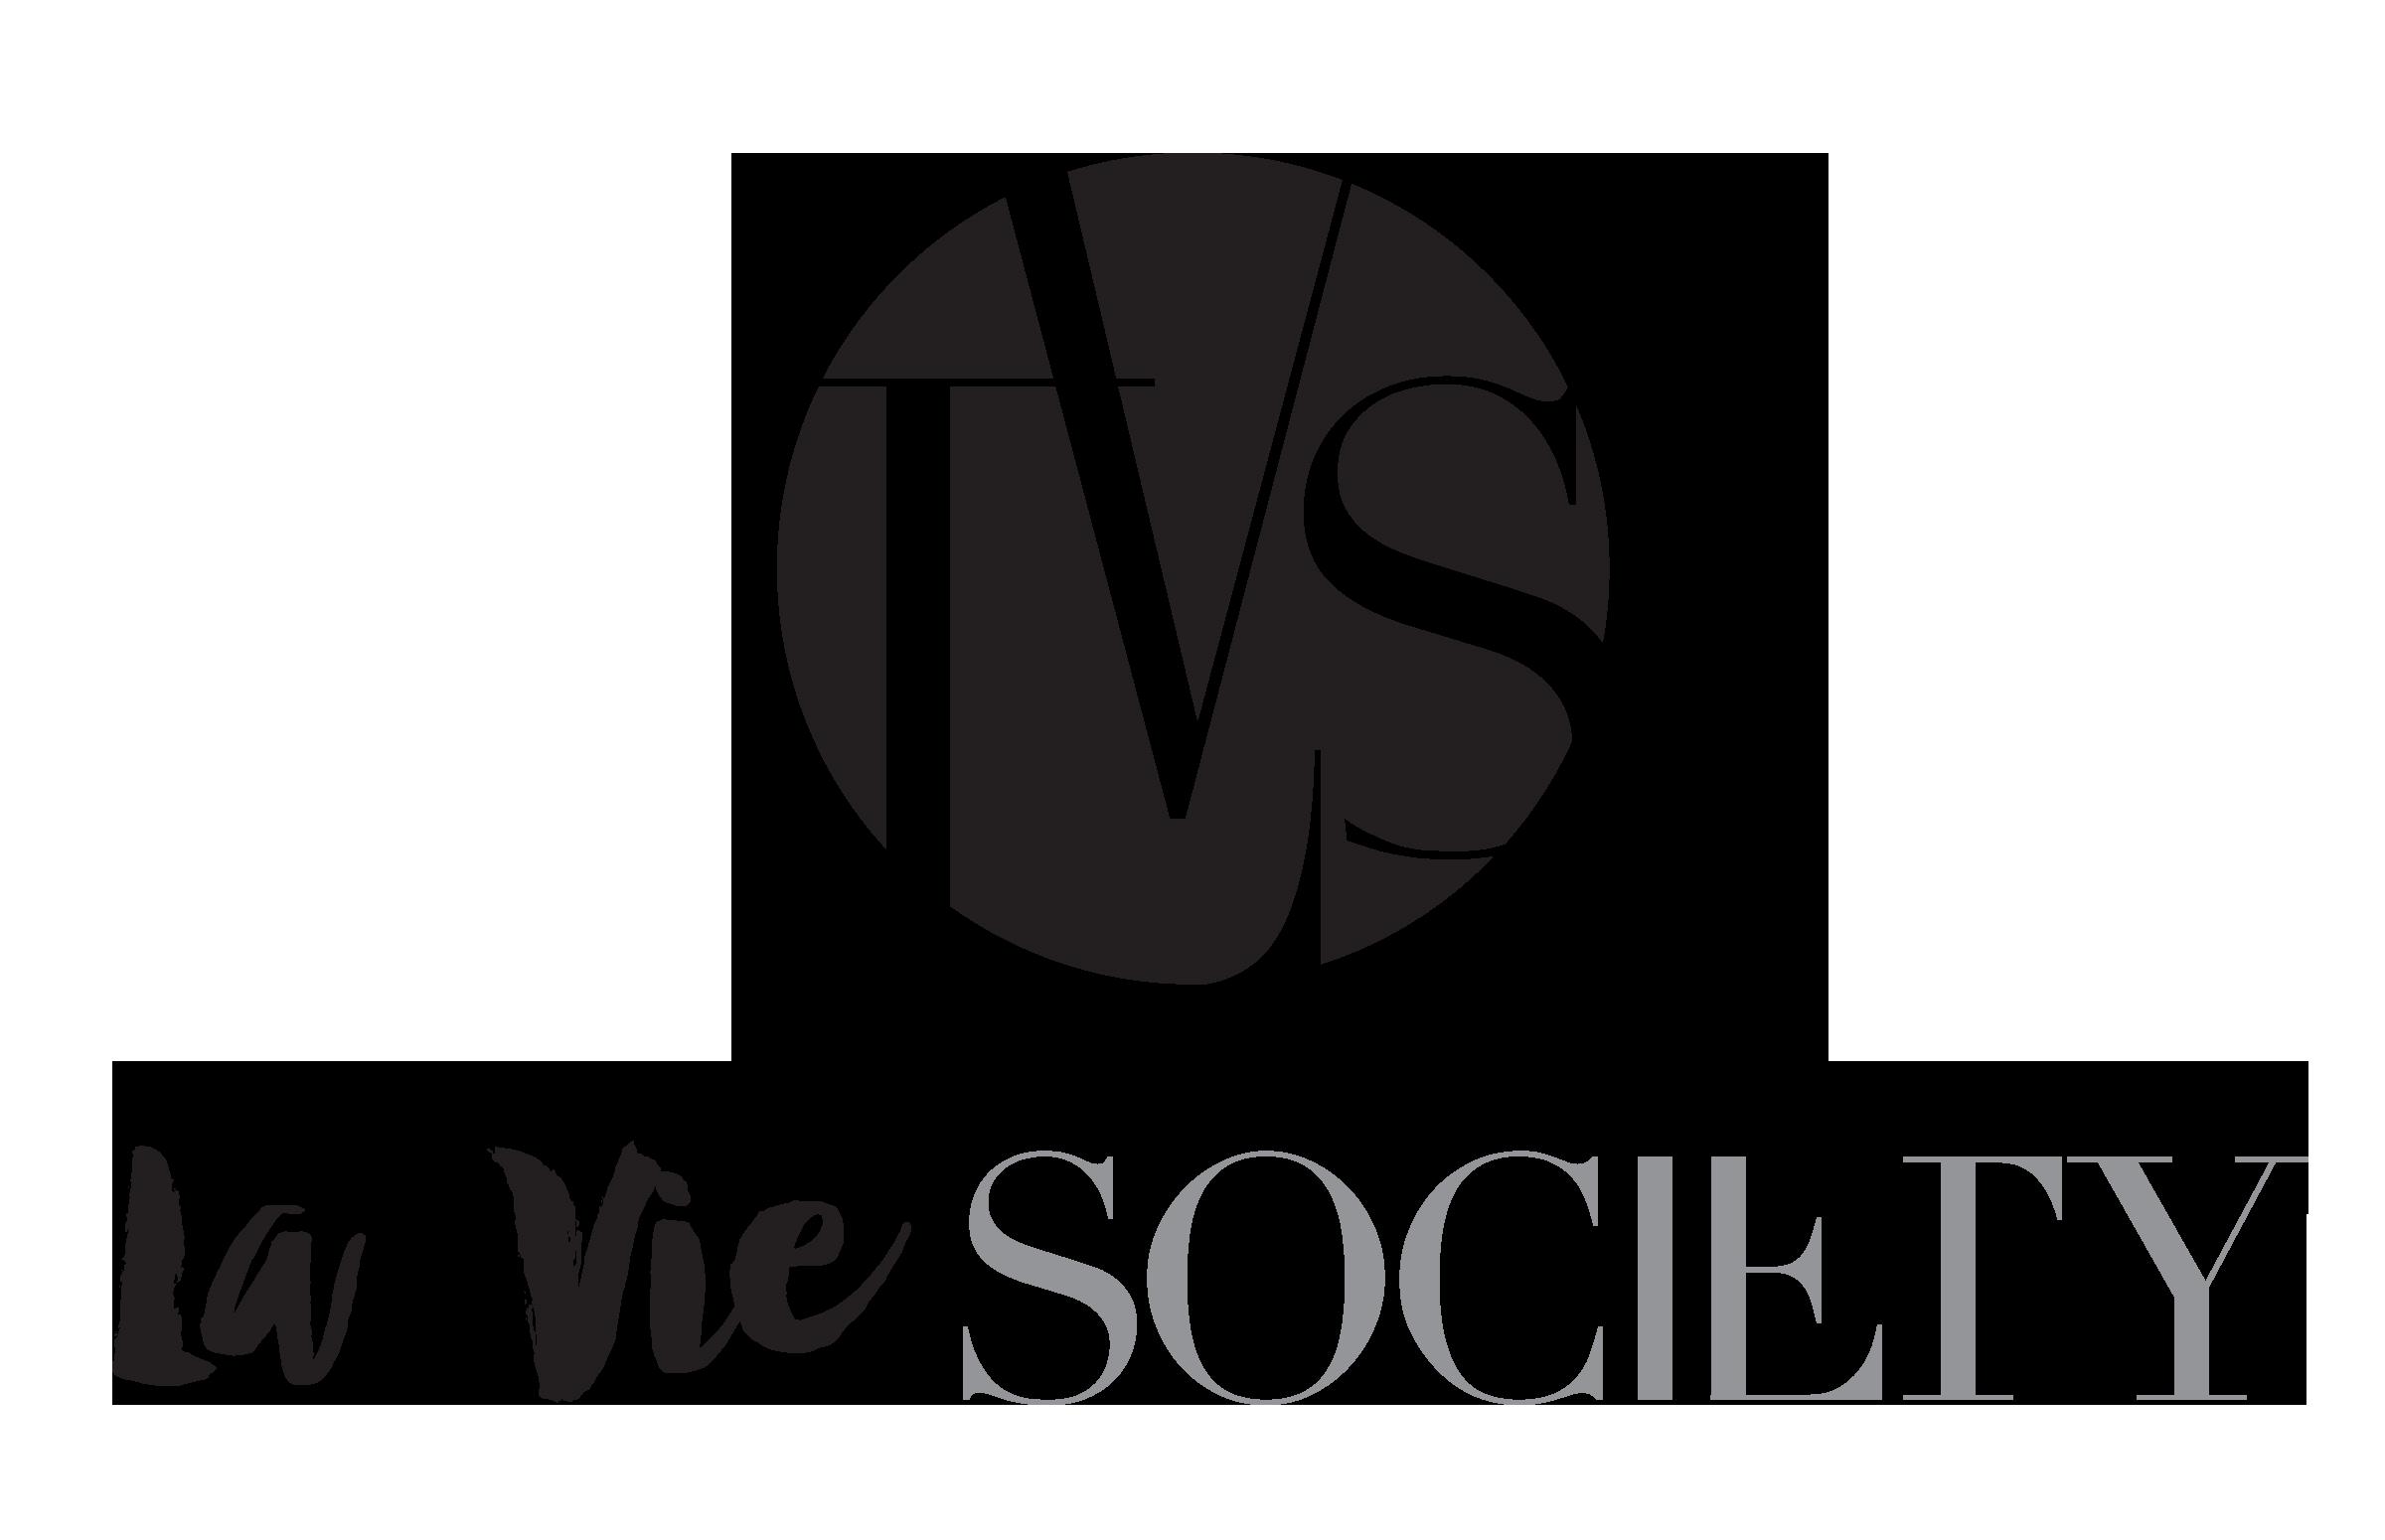 La Vie Society™